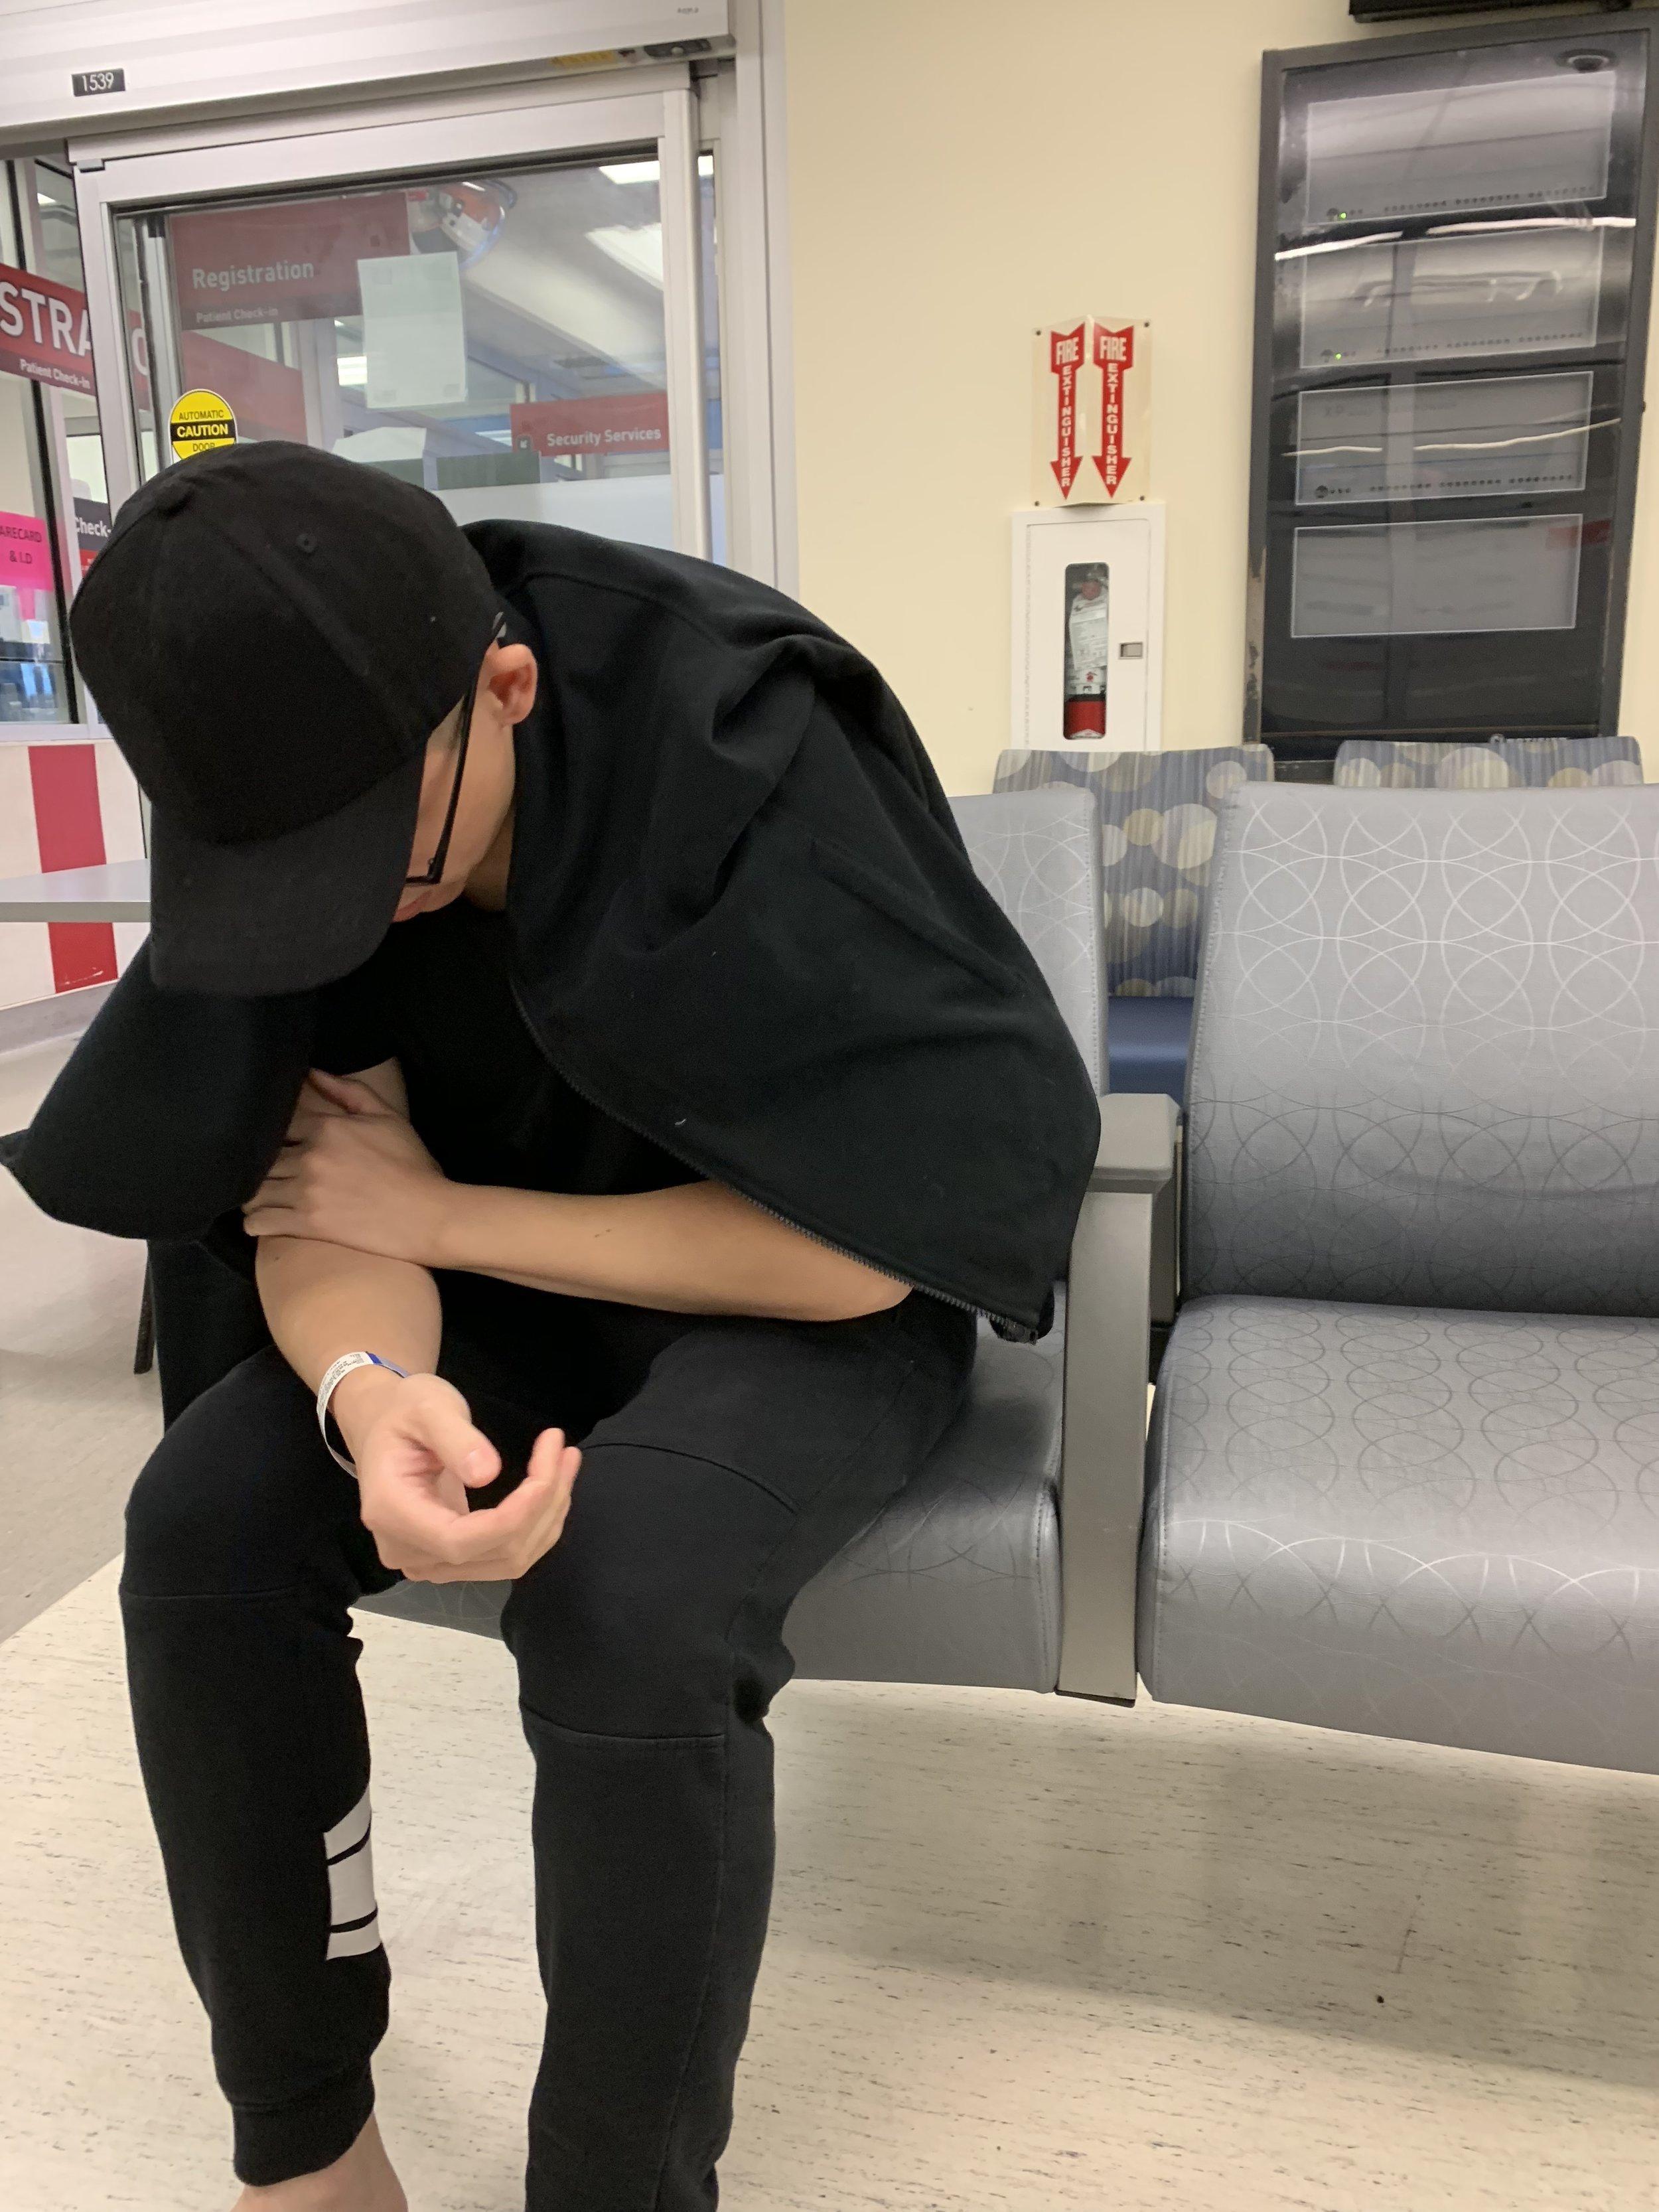 At the waiting room at the Richmond hospital